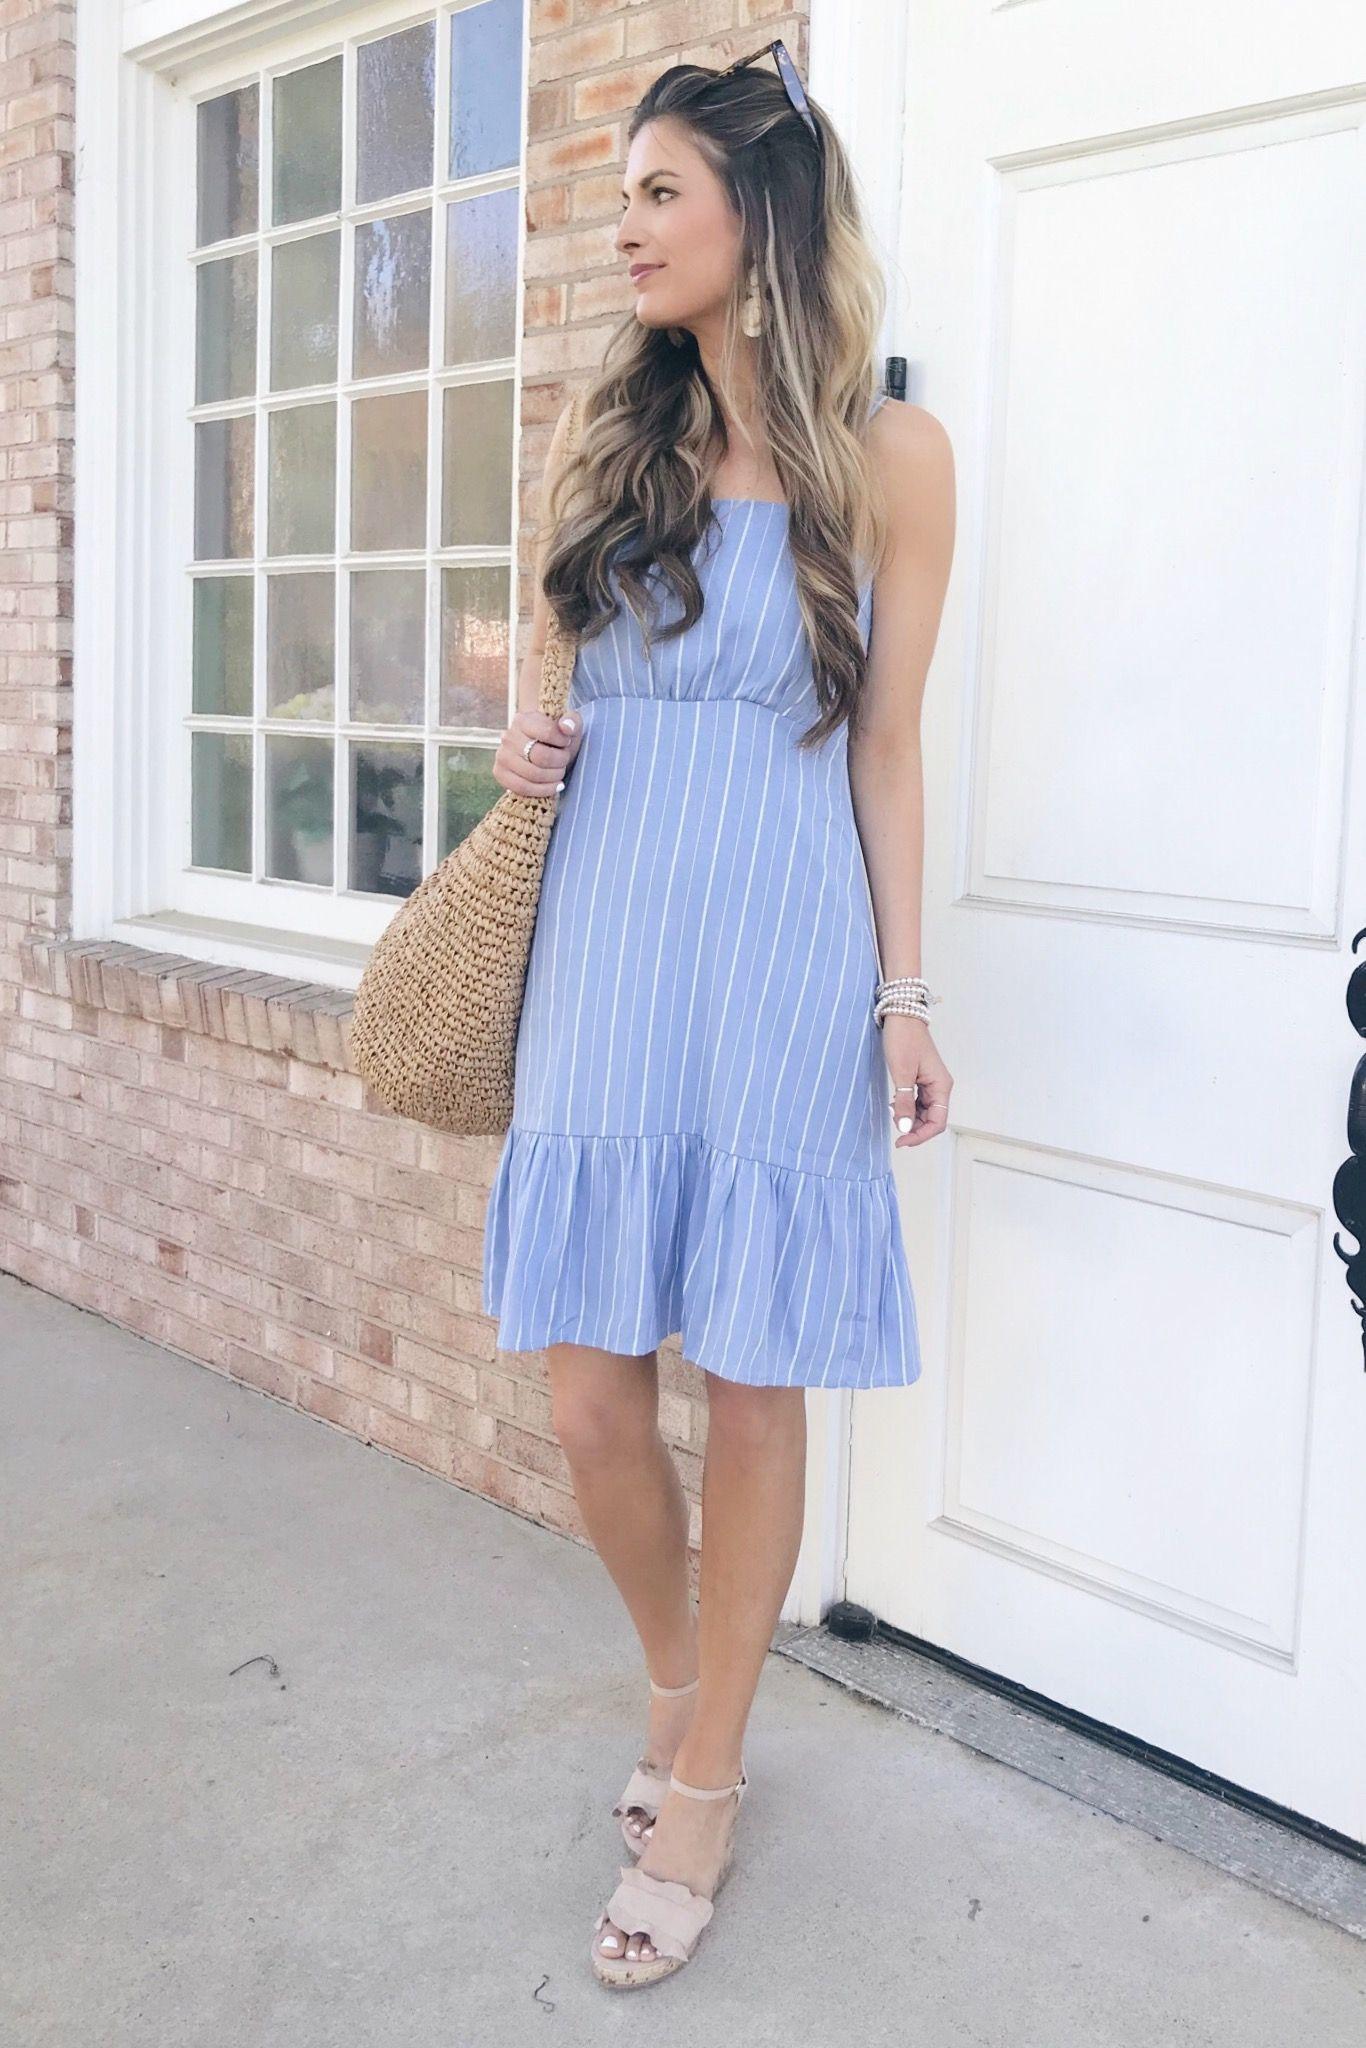 Walmart Dress Pinteresting Plans Fashion Blog In Blue Striped Midi Dress Walmart Dresses Spring Outfits Casual Stripe Outfits [ 2048 x 1366 Pixel ]